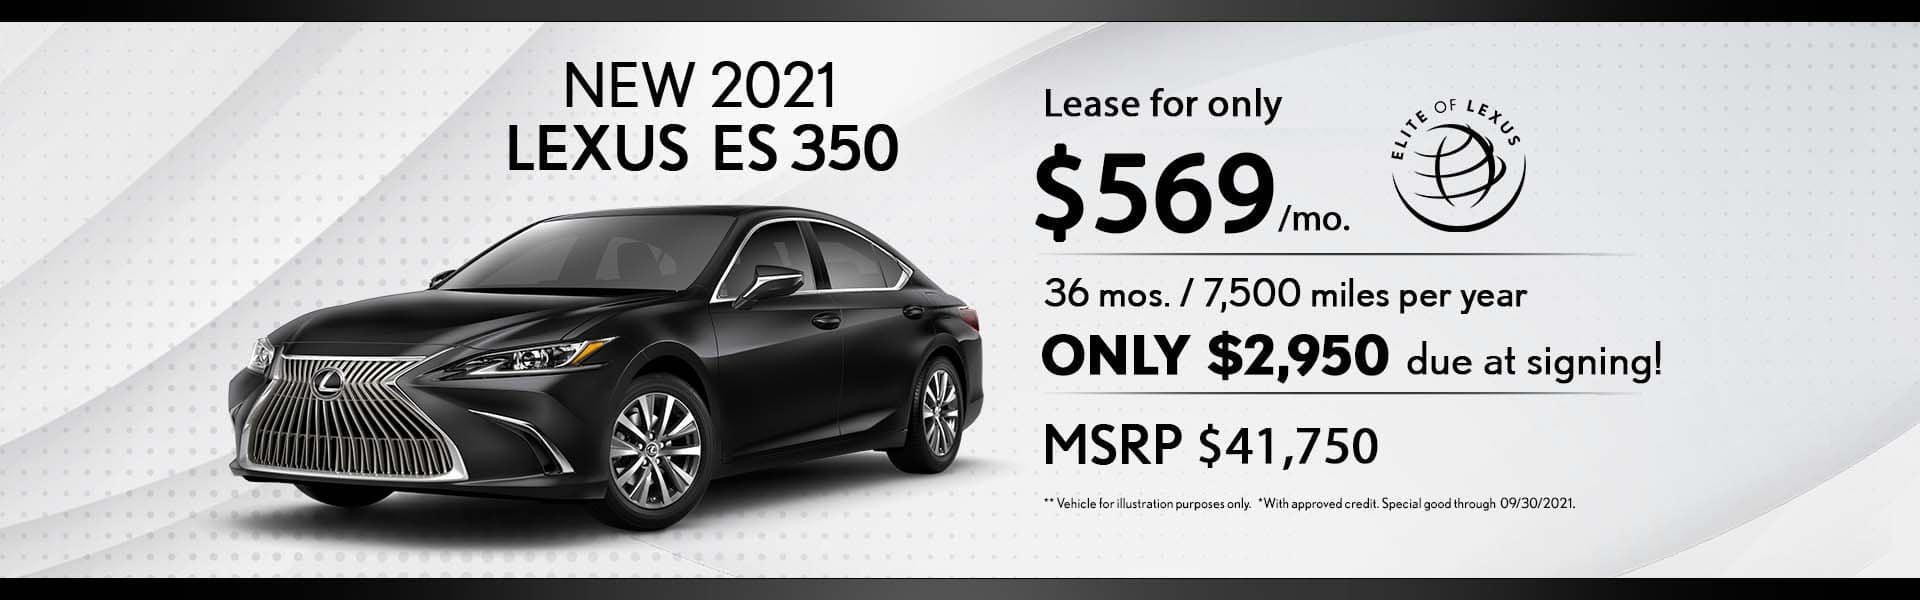 Lexus Lease special ES 350